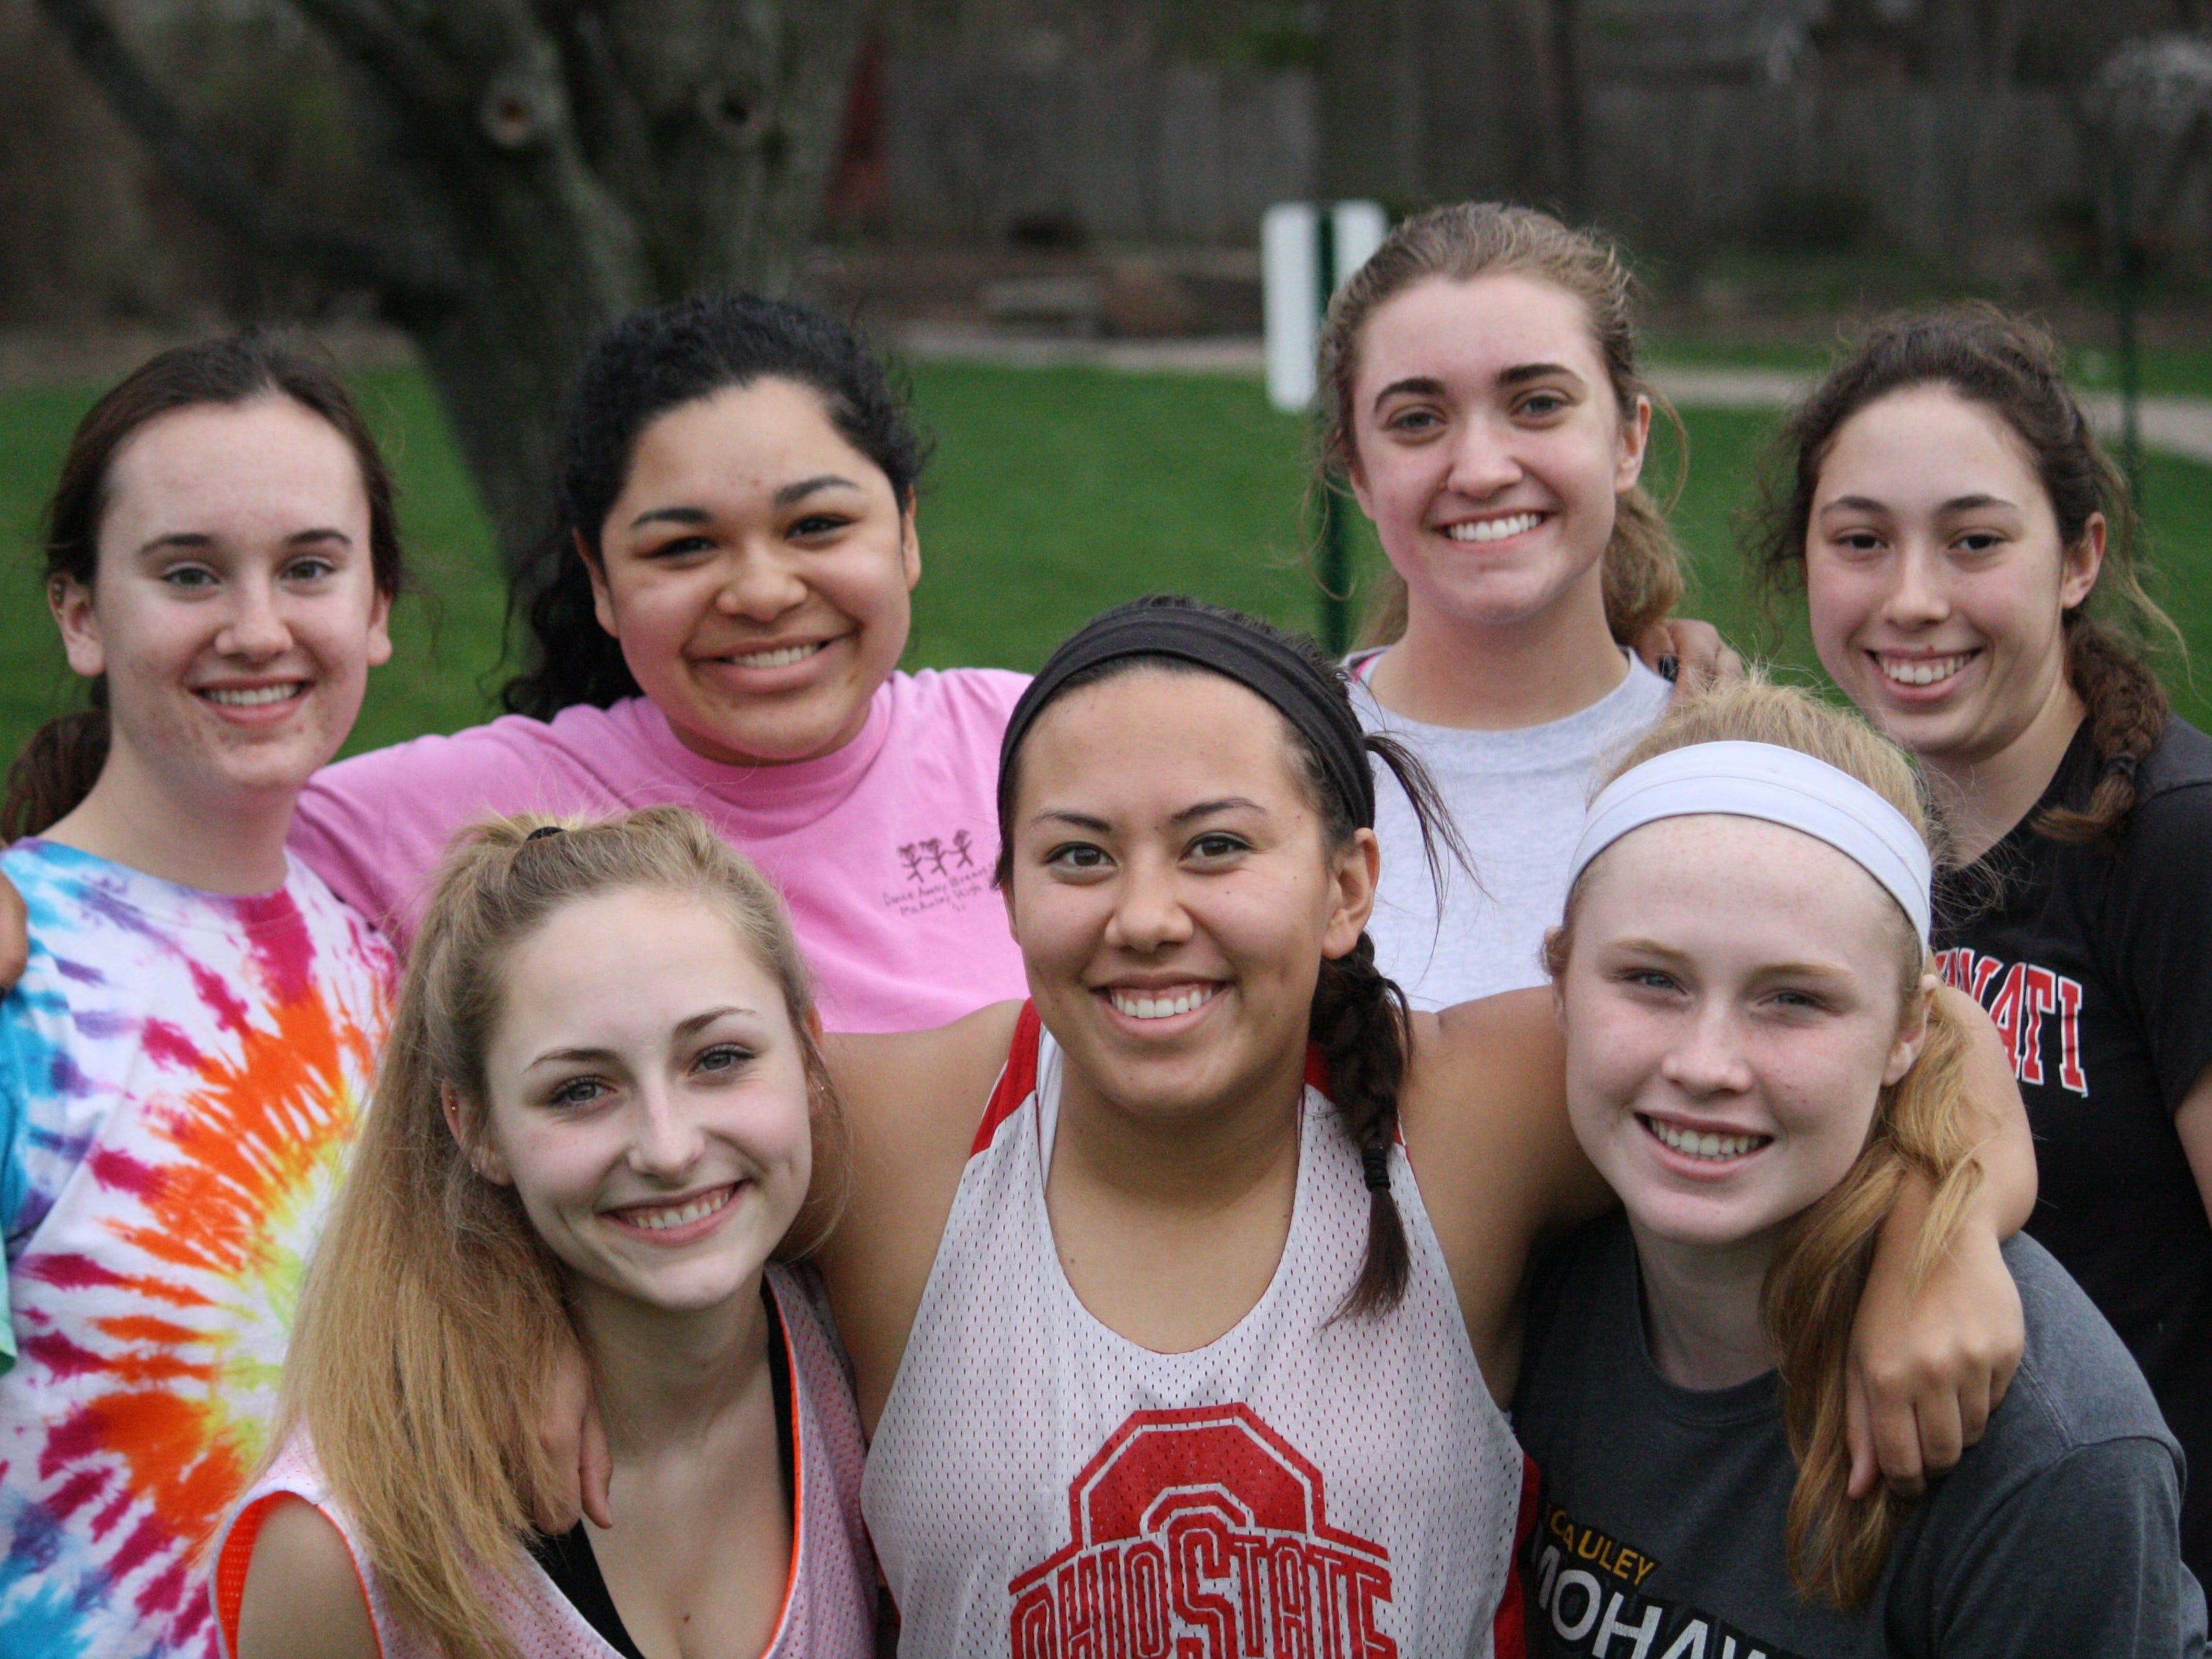 McAuley's 2015 senior lacrosse players from left (in back): Emma Pierani, Osmari Novoa, Emma Curnutte and Maria Koenig; (in front) Jessica Ventura, Bailey Ernst and Kate Calder. Not pictured: Erika Ventura.